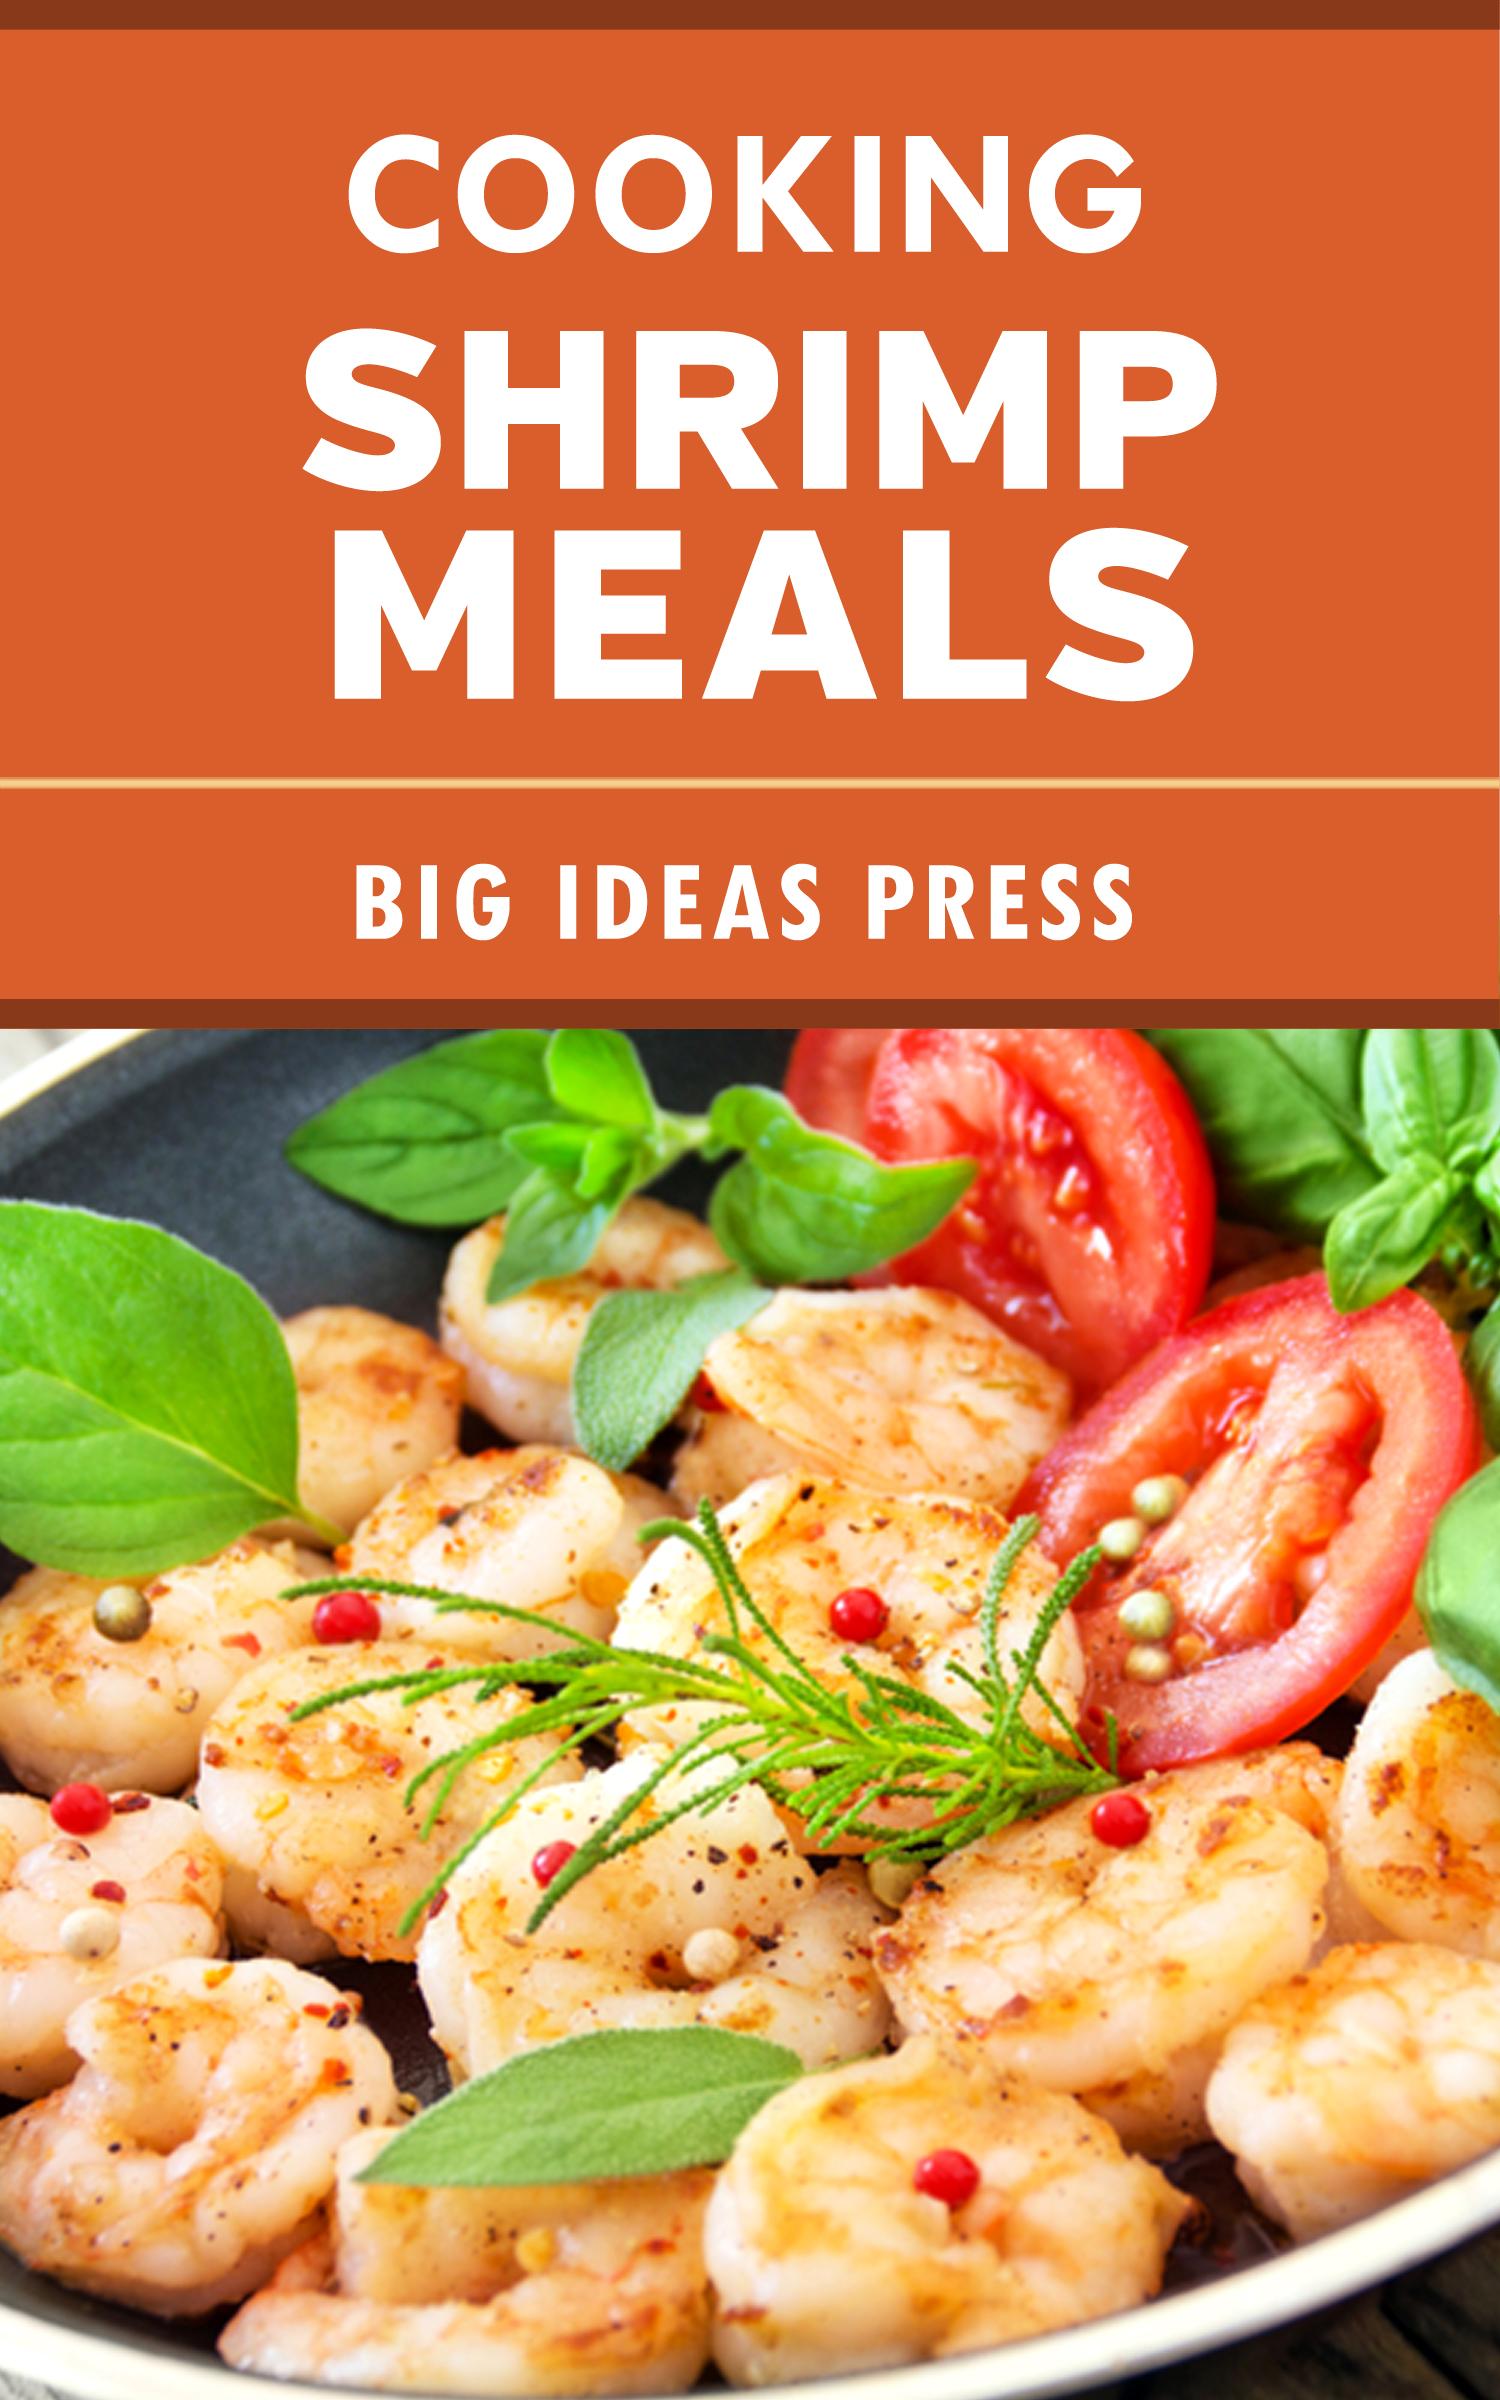 Smashwords Cooking Shrimp Meals A Book By Big Ideas Press